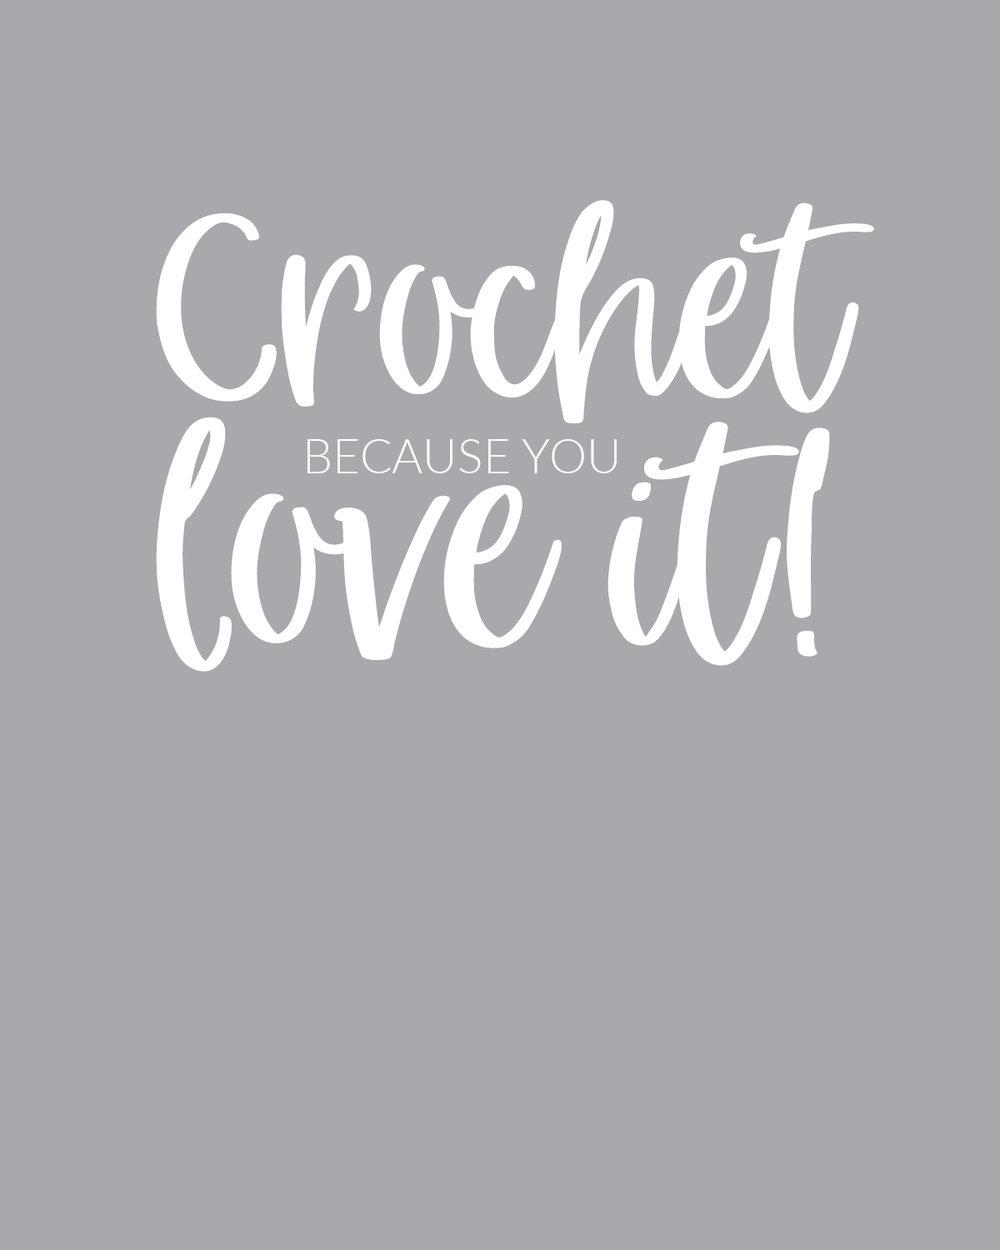 Crochet Because You Love It_web.jpg